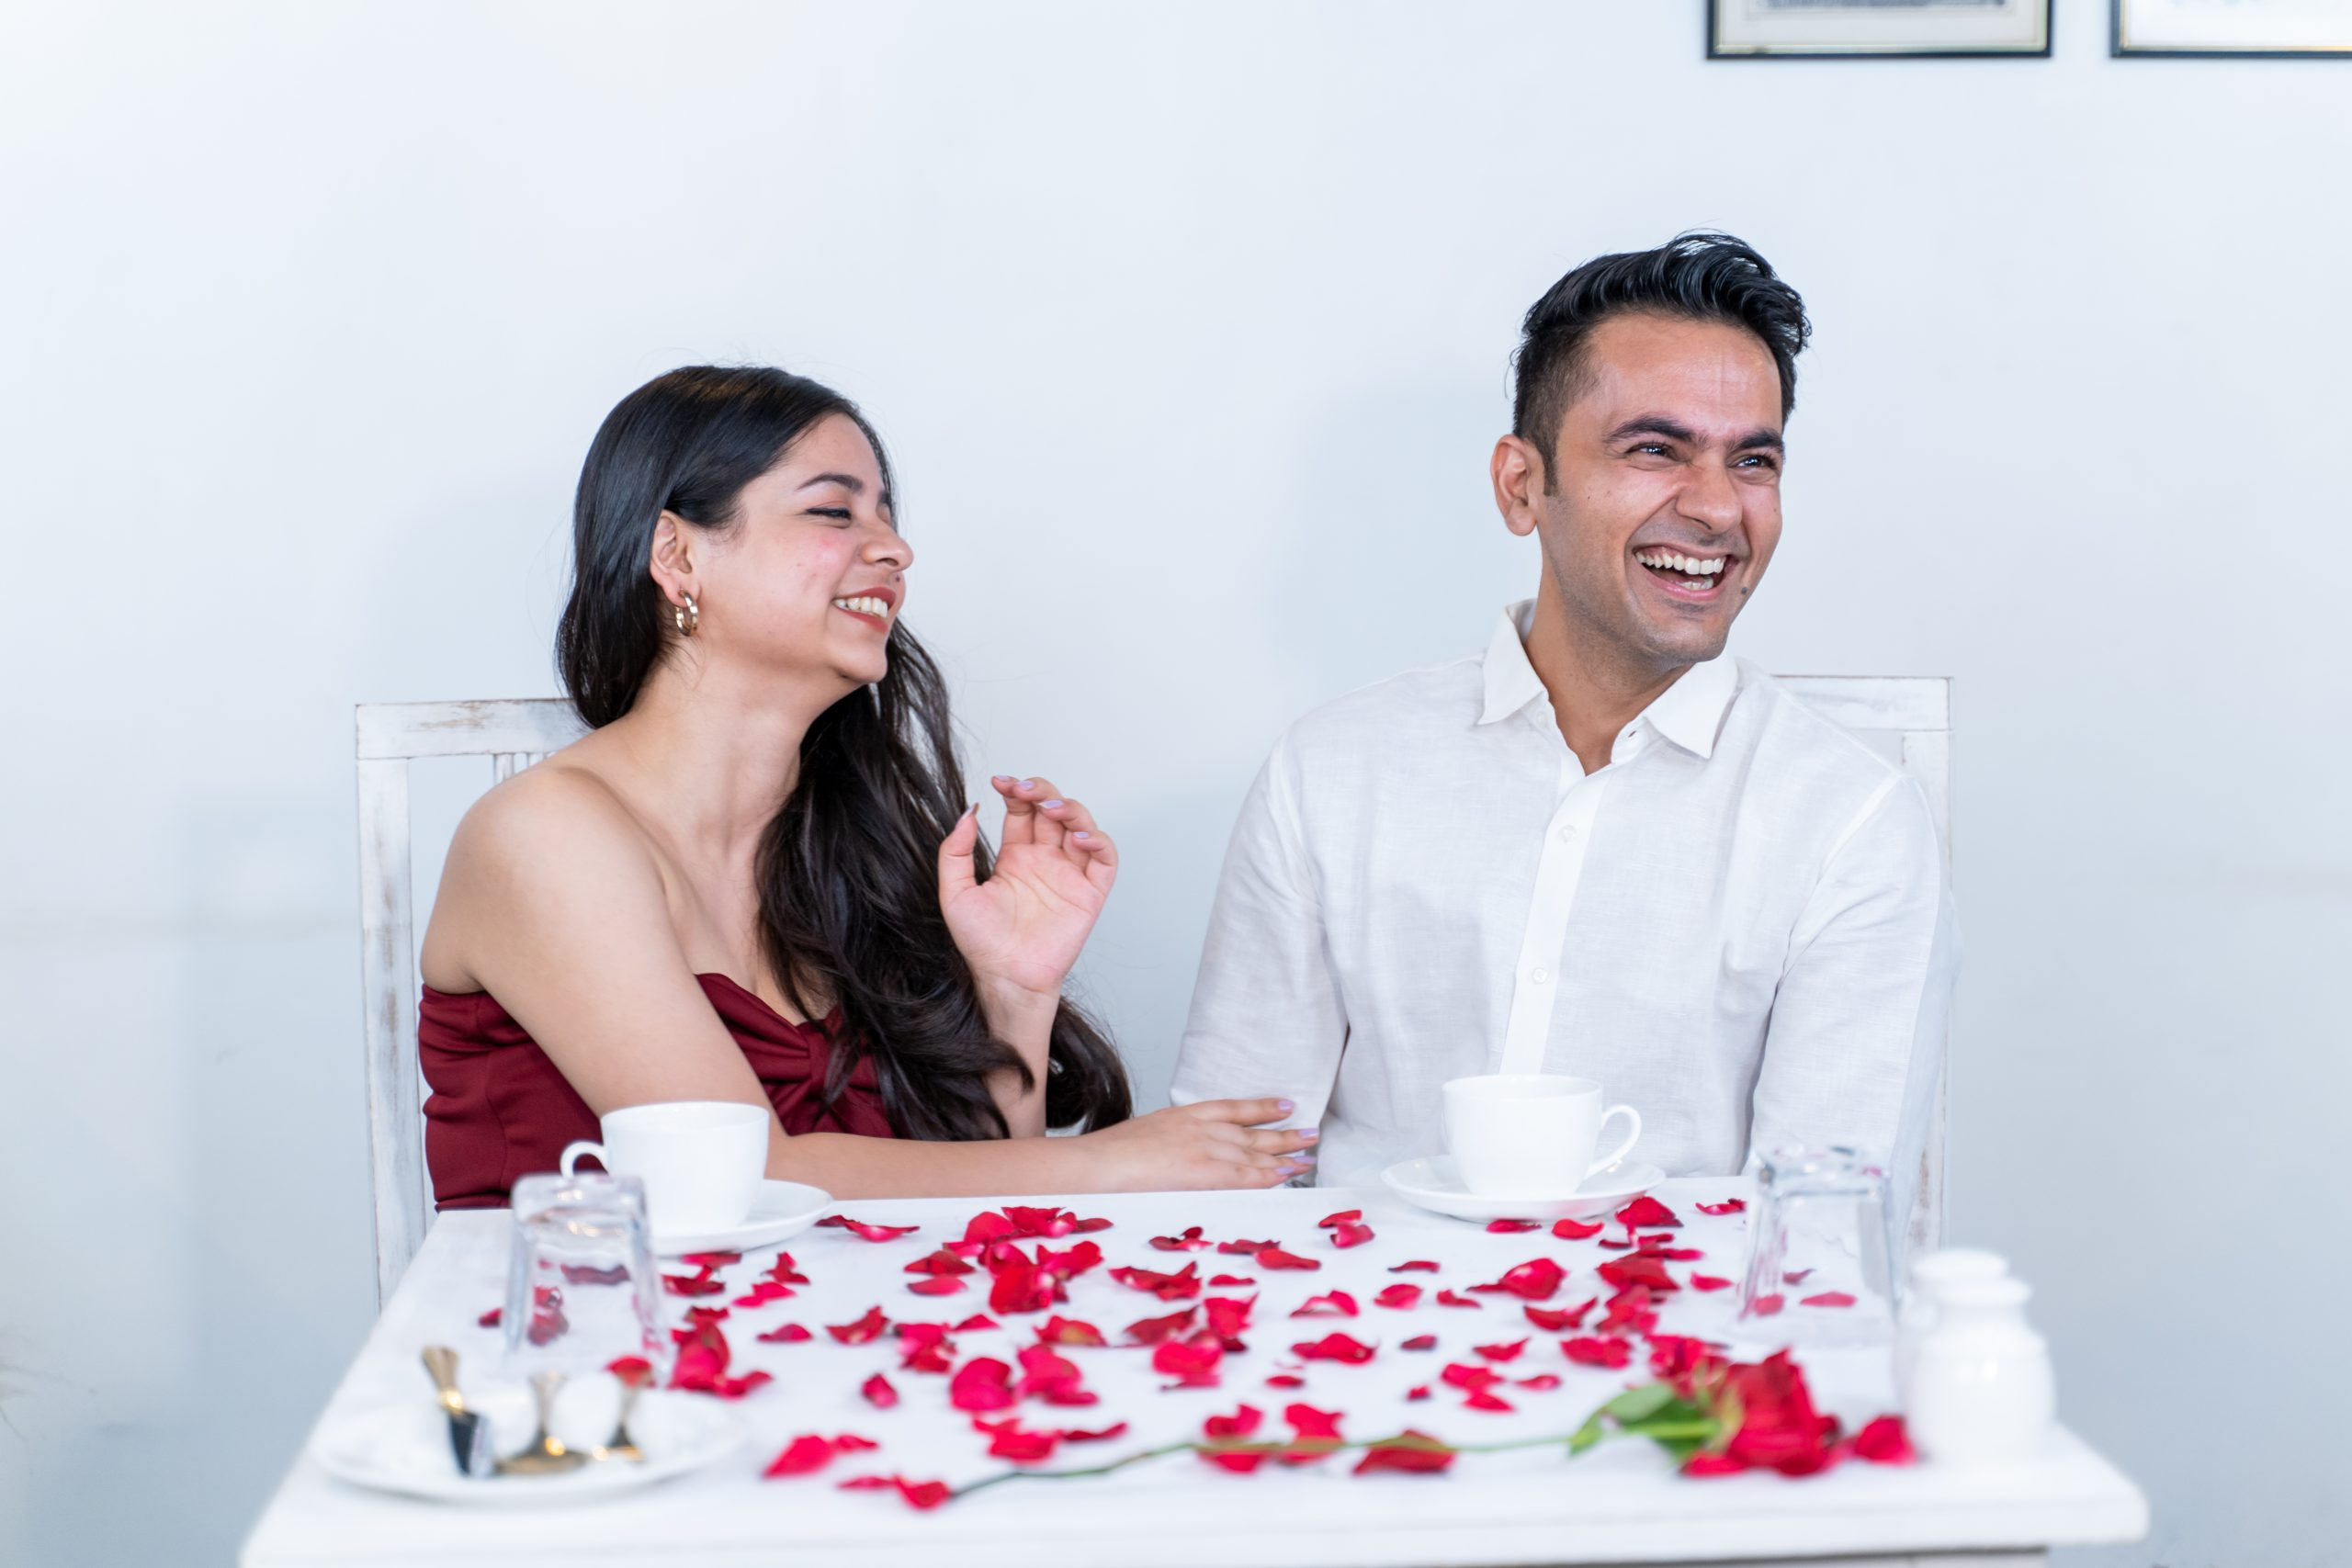 Couple having fun on the date